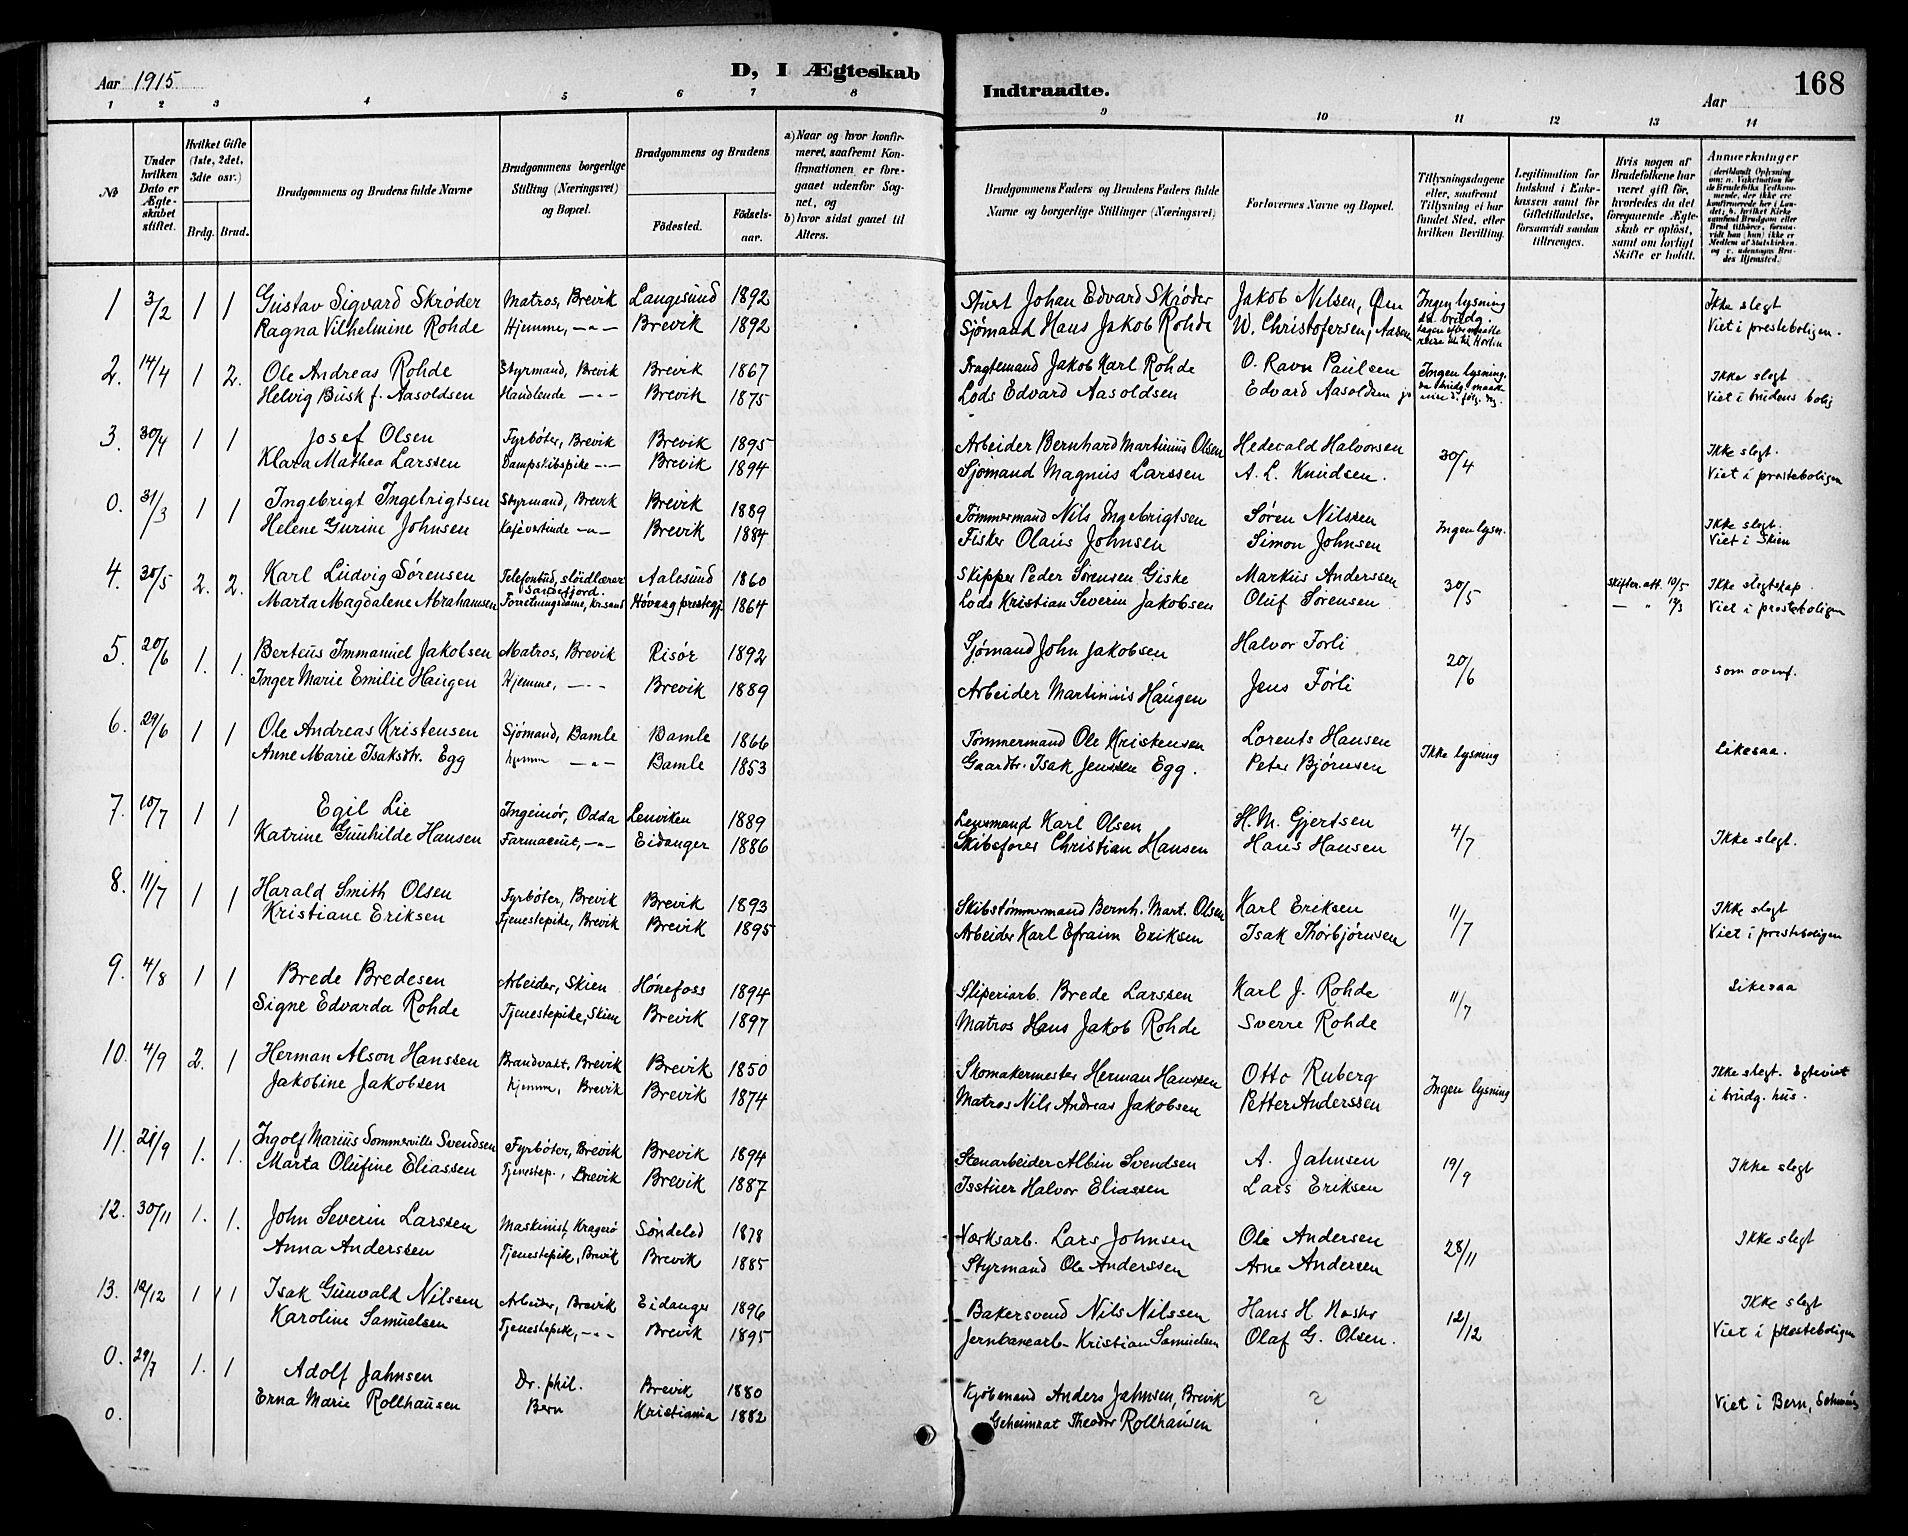 SAKO, Brevik kirkebøker, G/Ga/L0005: Klokkerbok nr. 5, 1901-1924, s. 168